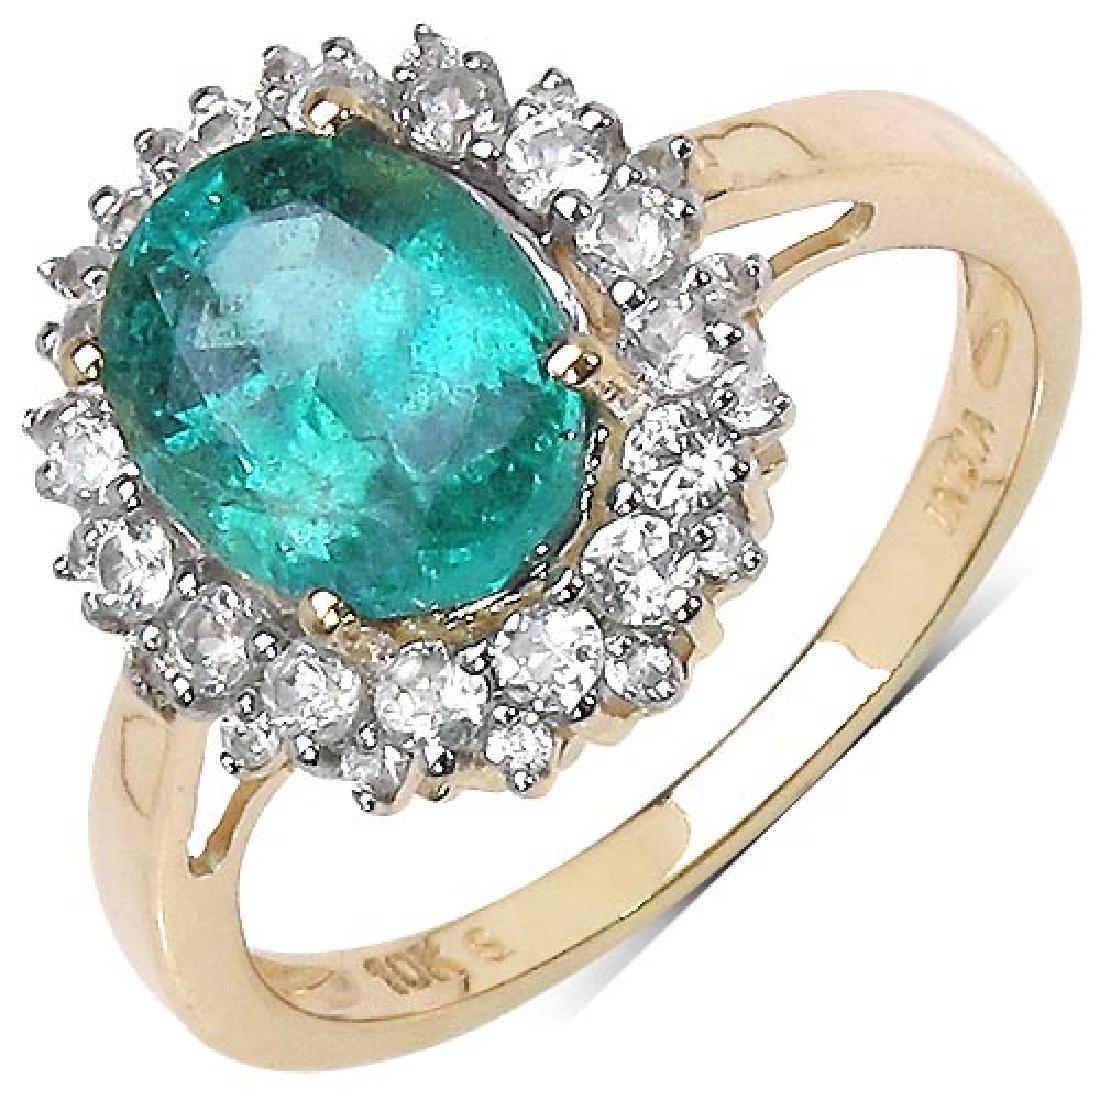 2.45 Carat Genuine Emerald 10K Yellow Gold Ring